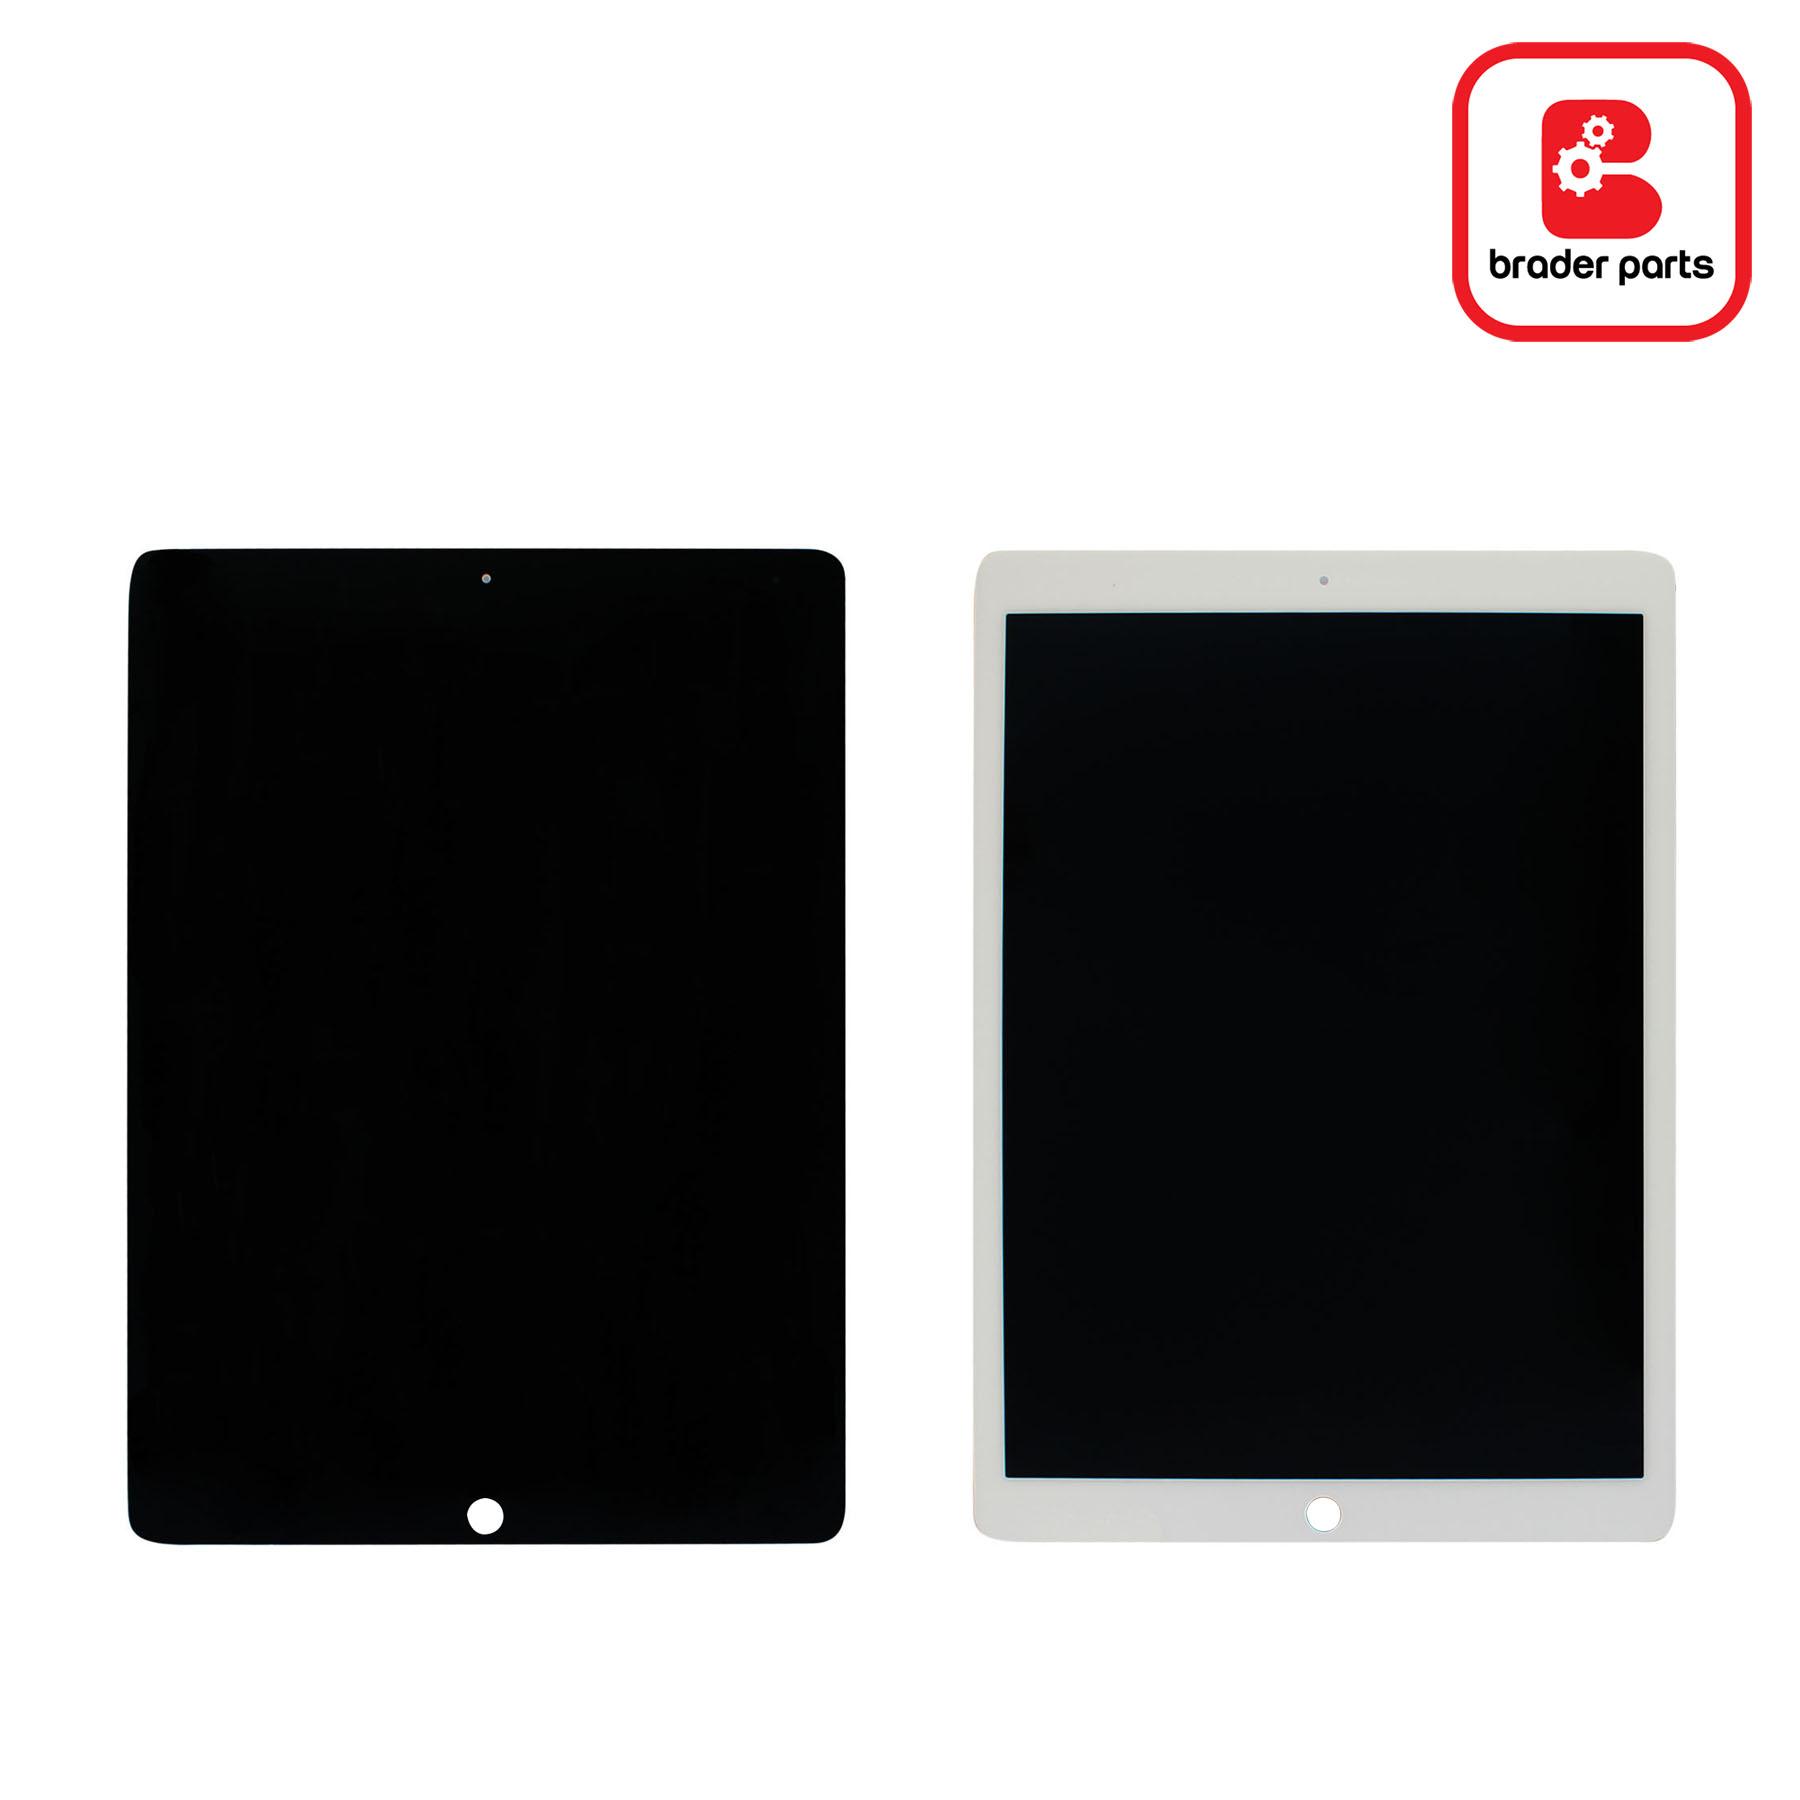 "Lcd Touchscreen iPad Pro 12.9"" Gen 2"